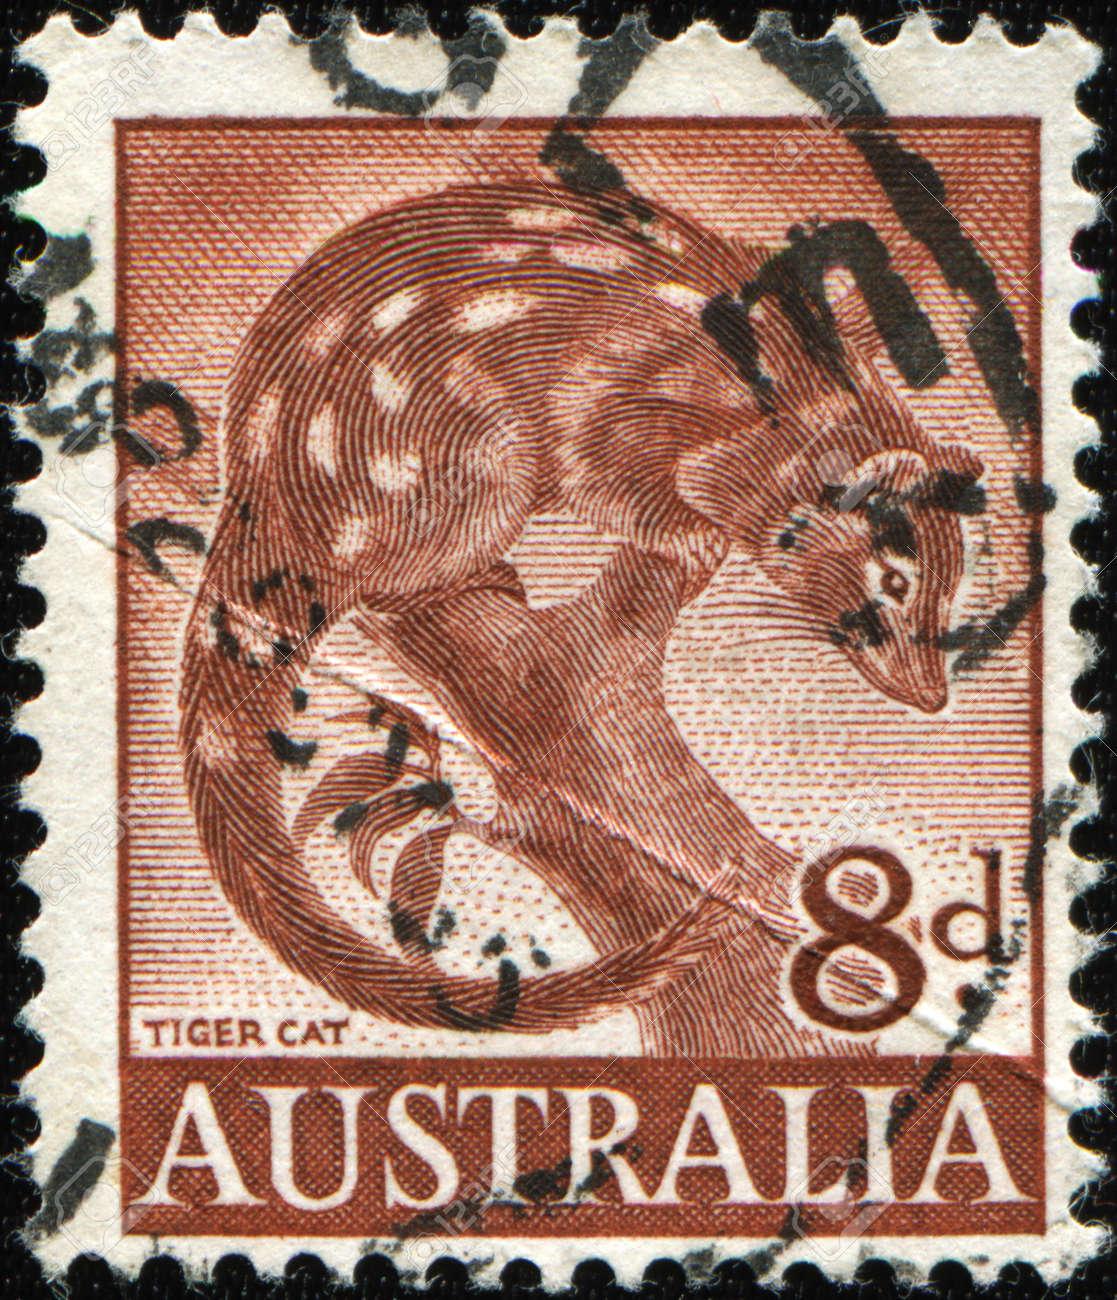 AUSTRALIA - CIRCA 1960: An Australian Used Postage Stamp shows tiger cat, circa 1960 Stock Photo - 8682029